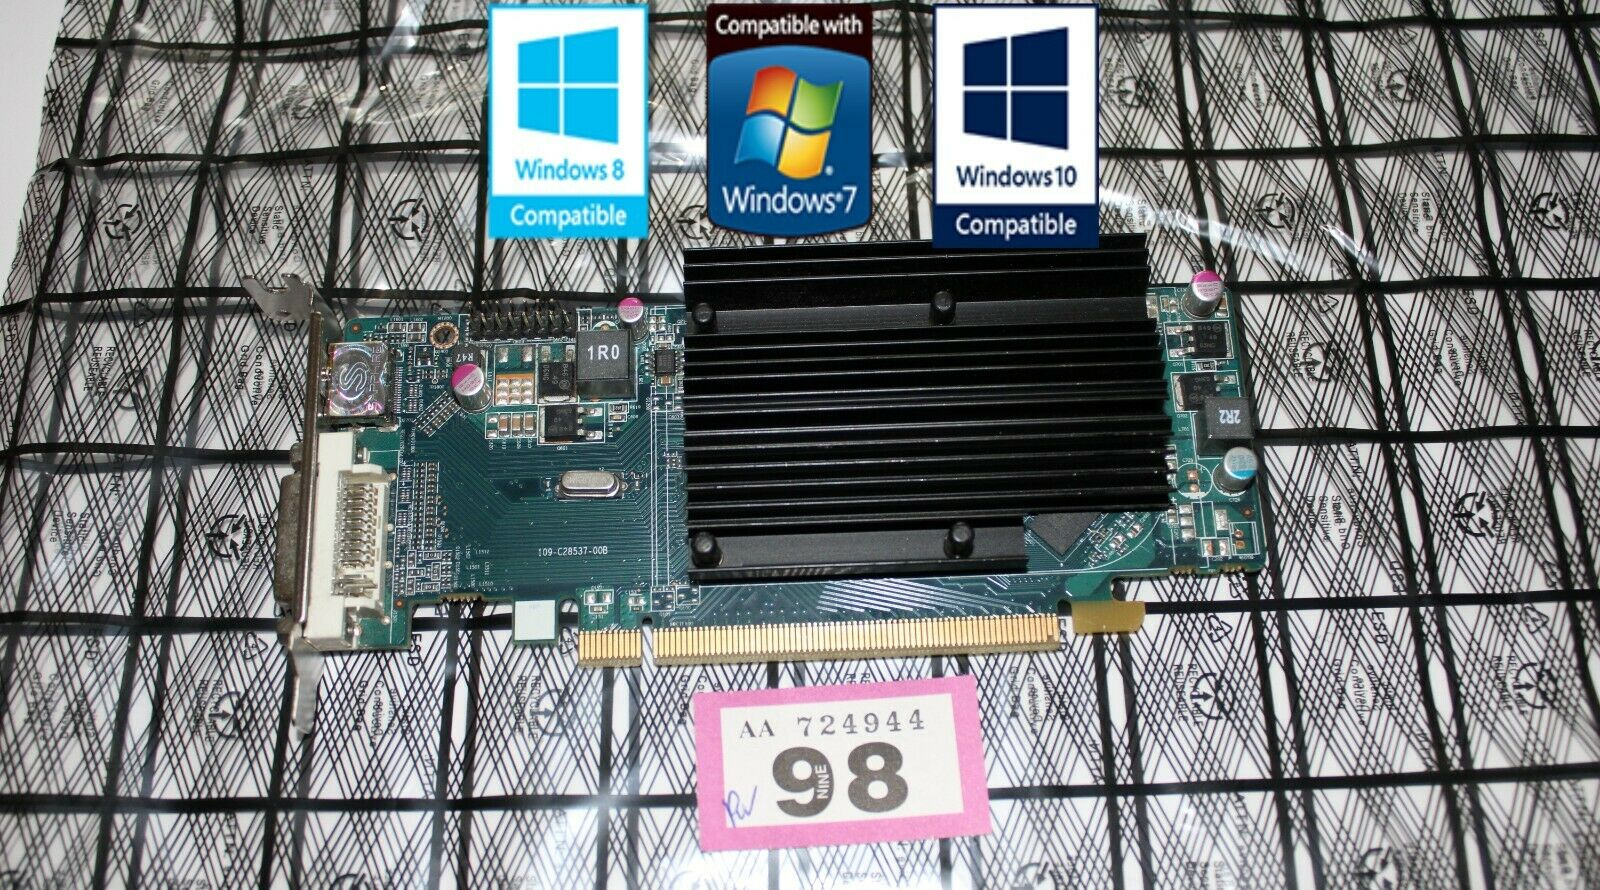 sapphire ATI AMD RADEON HD5450 1GB HDMI DVI Low profile